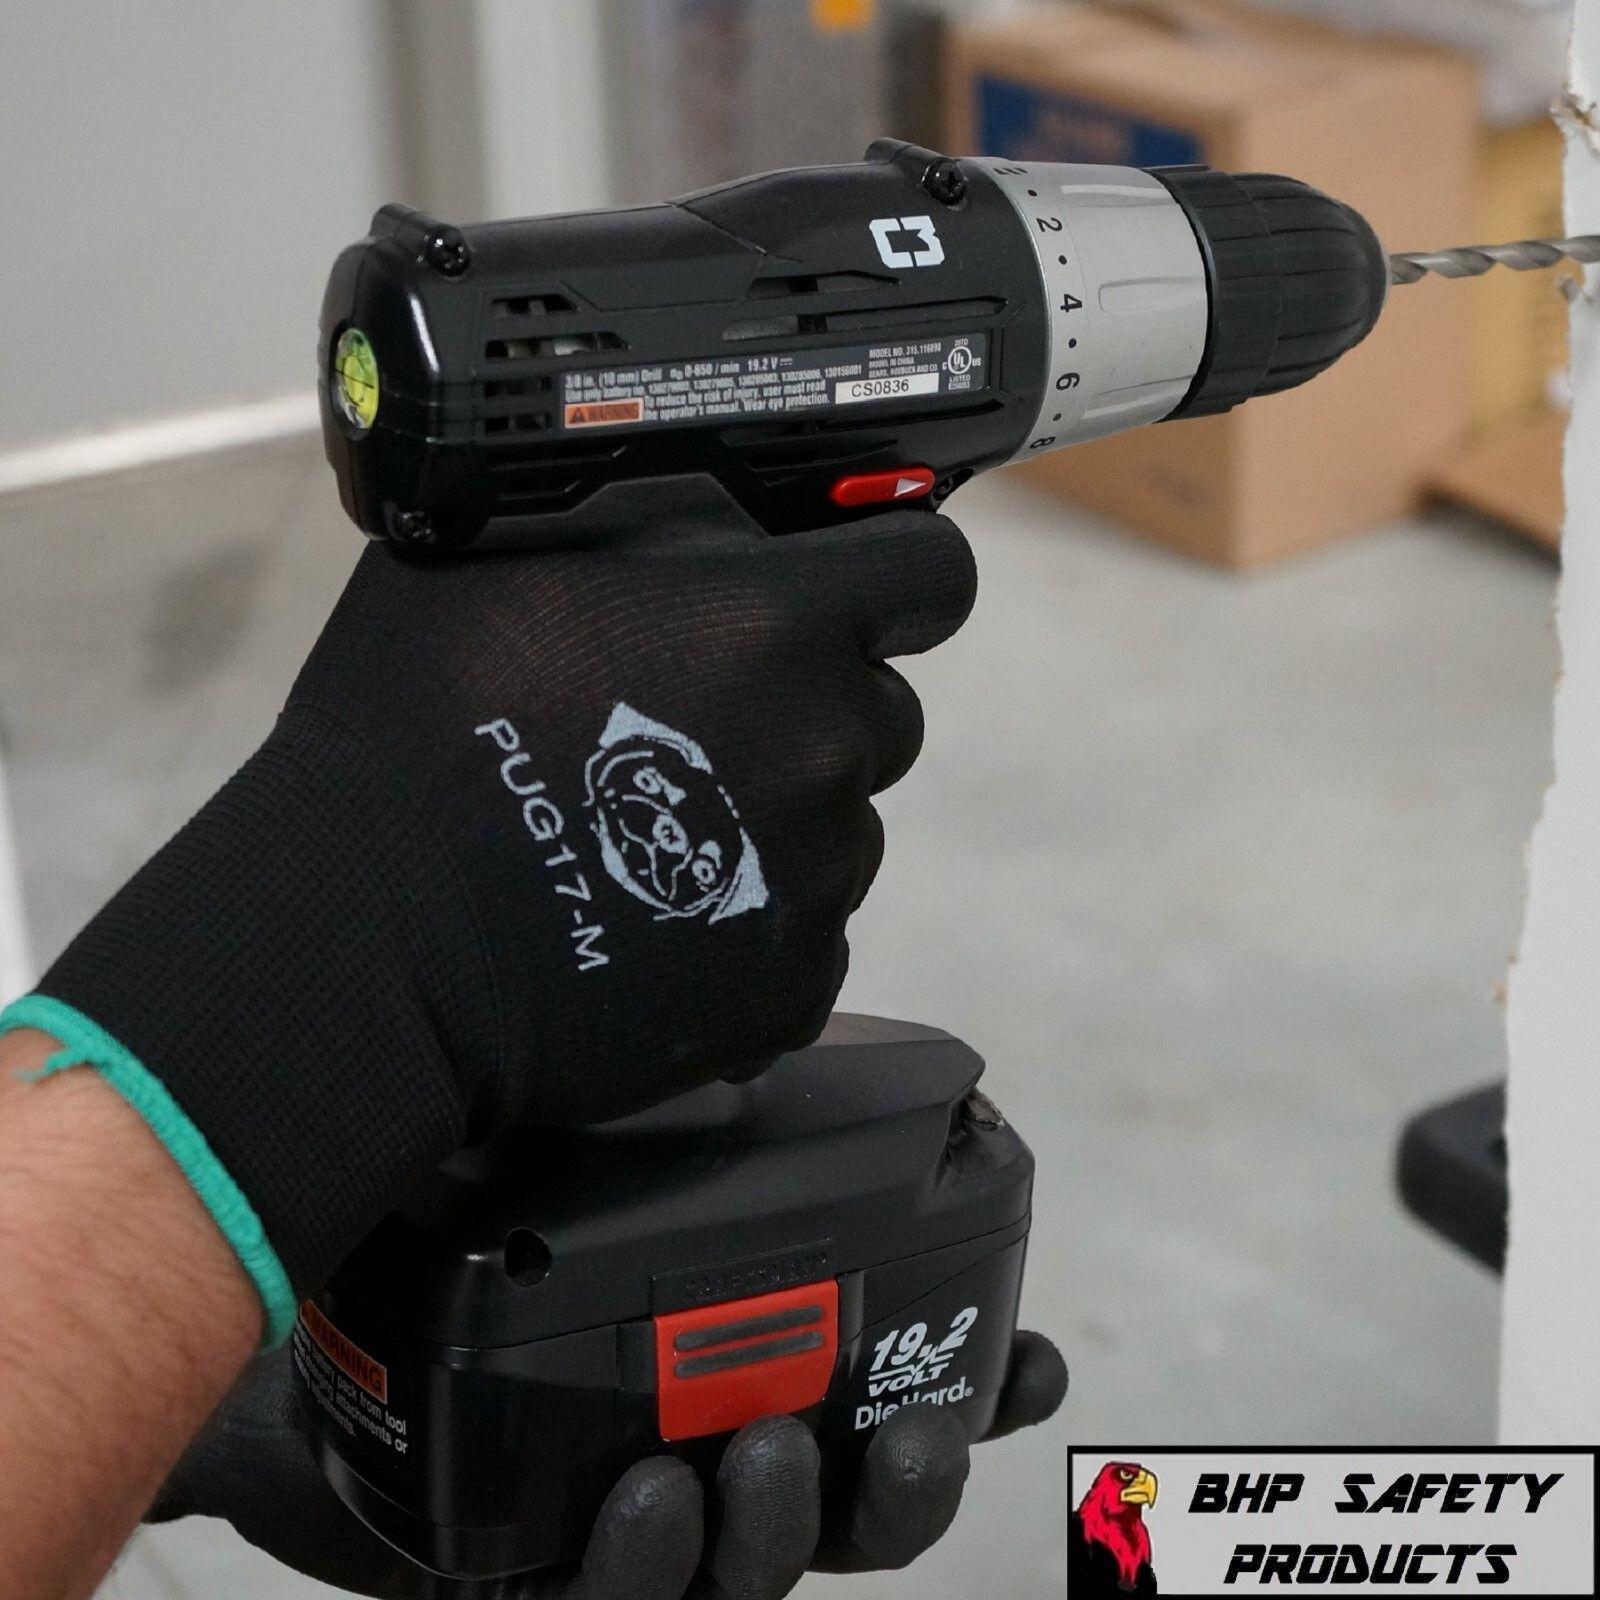 Купить Global Glove PUG - GLOBAL GLOVE PU POLYURETHANE COATED WORK GLOVES 12 PAIR PUG17 (S,M, L, AND XL)